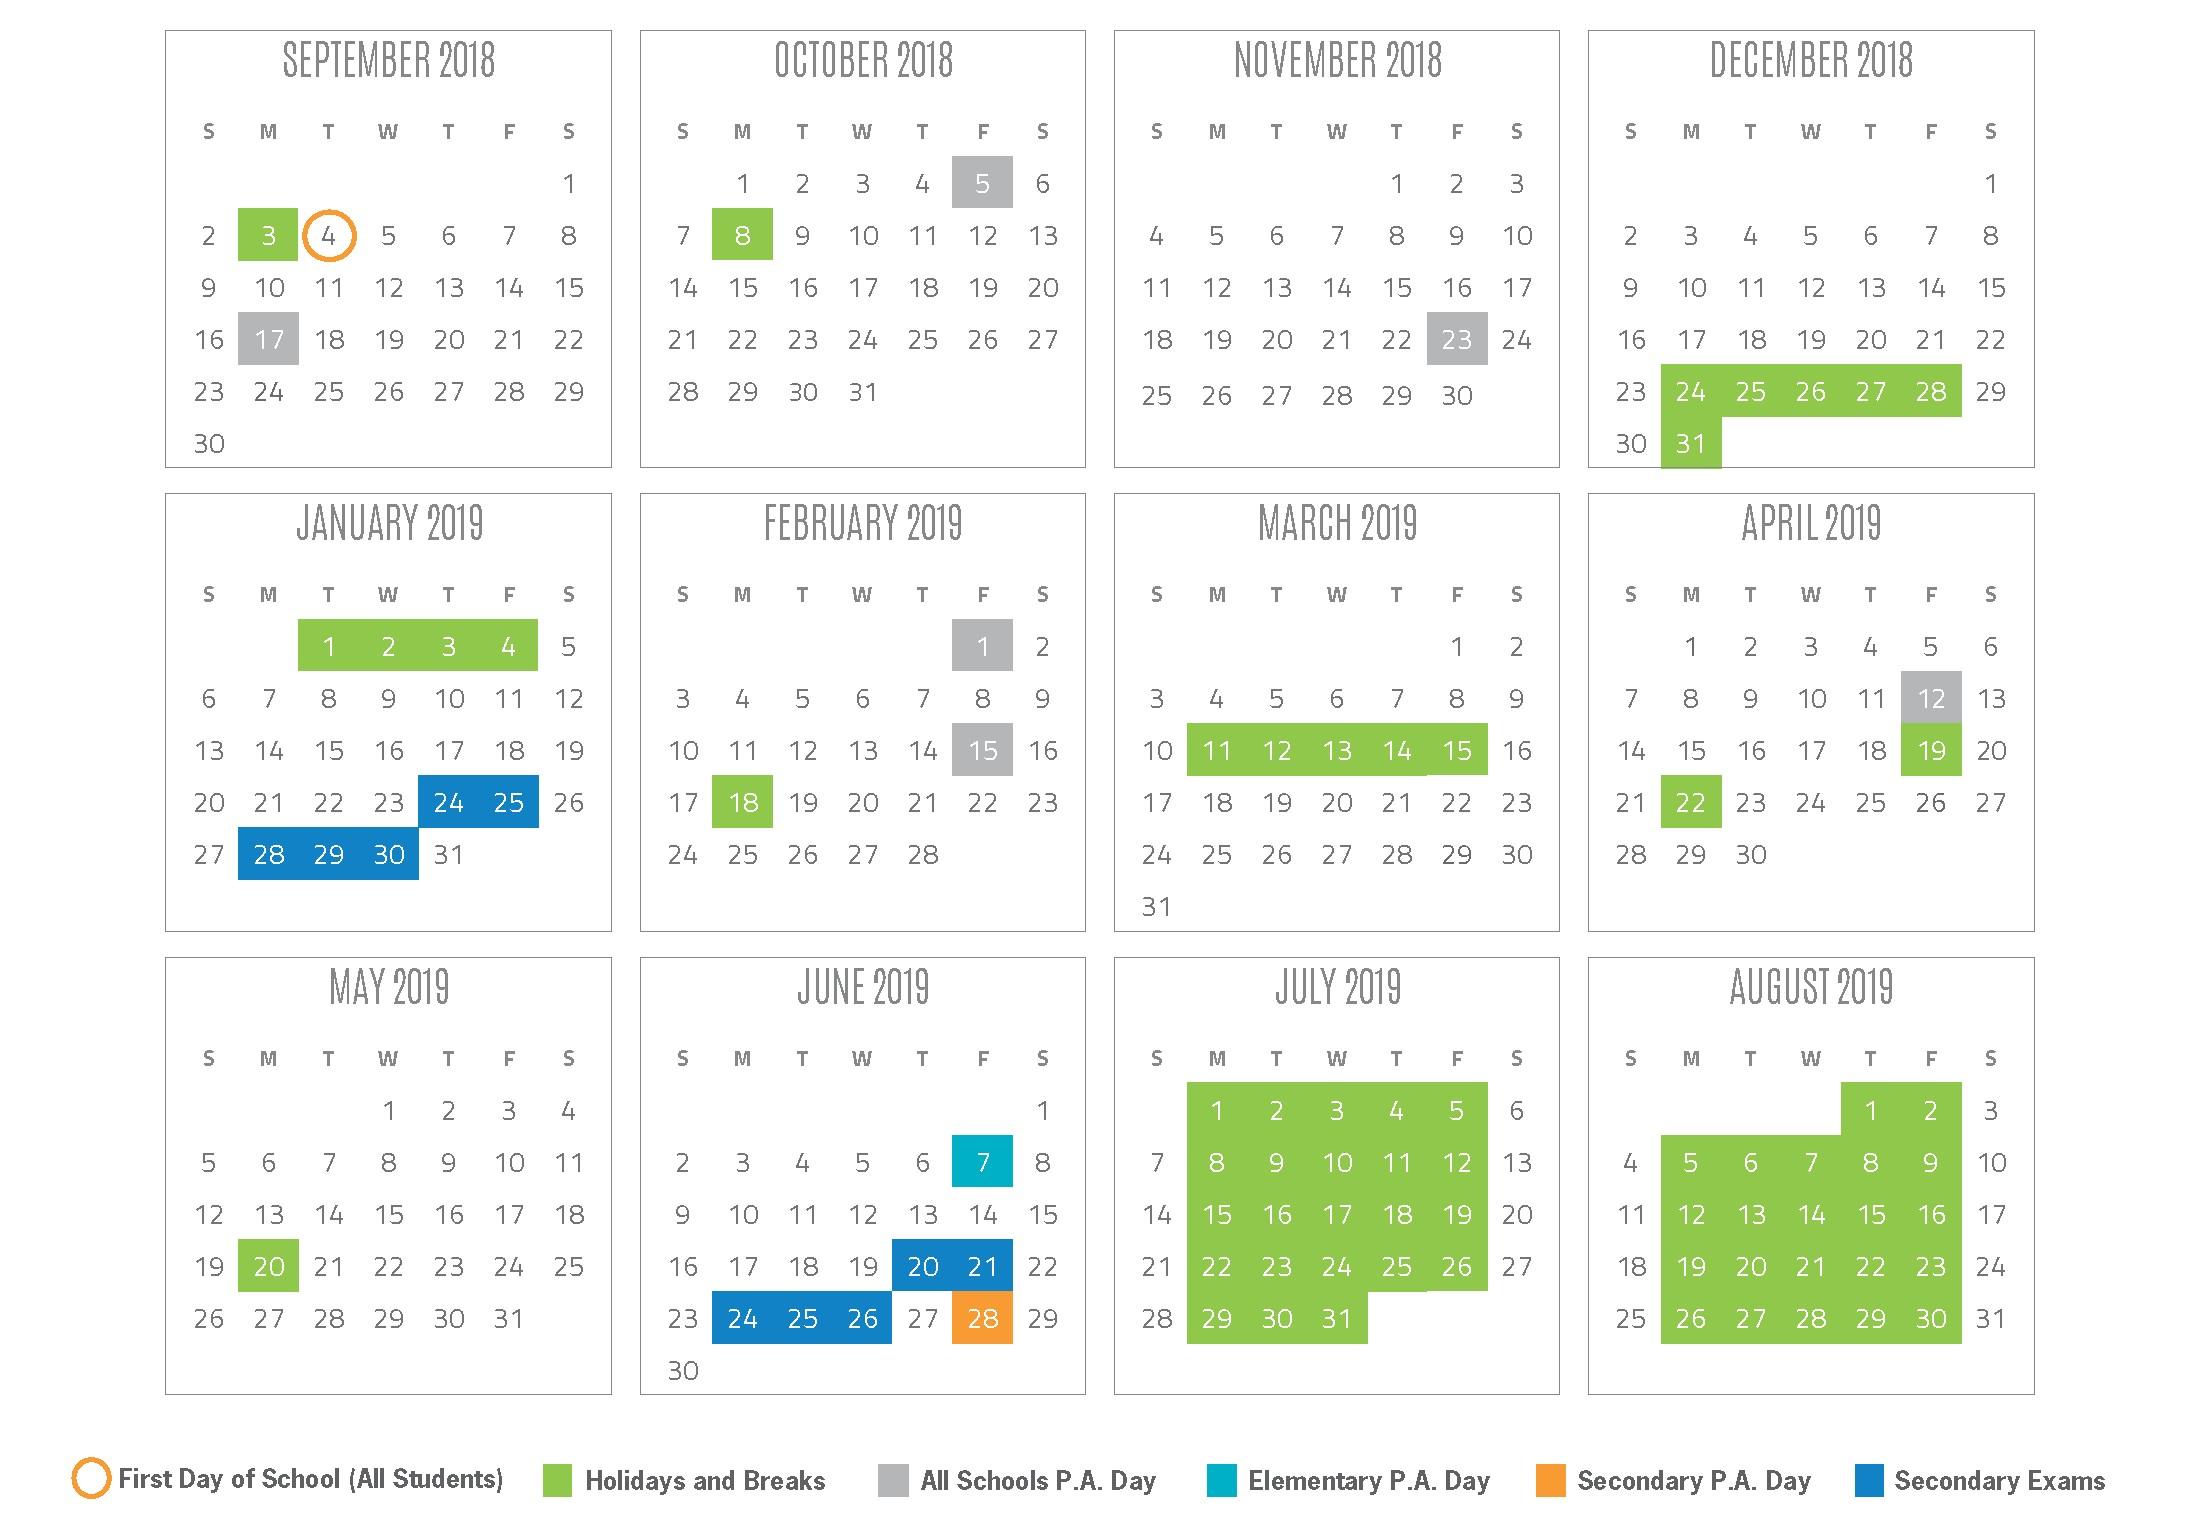 2018 and 2019 Calendar Planner Recientes 2018 2019 School Year Calendar